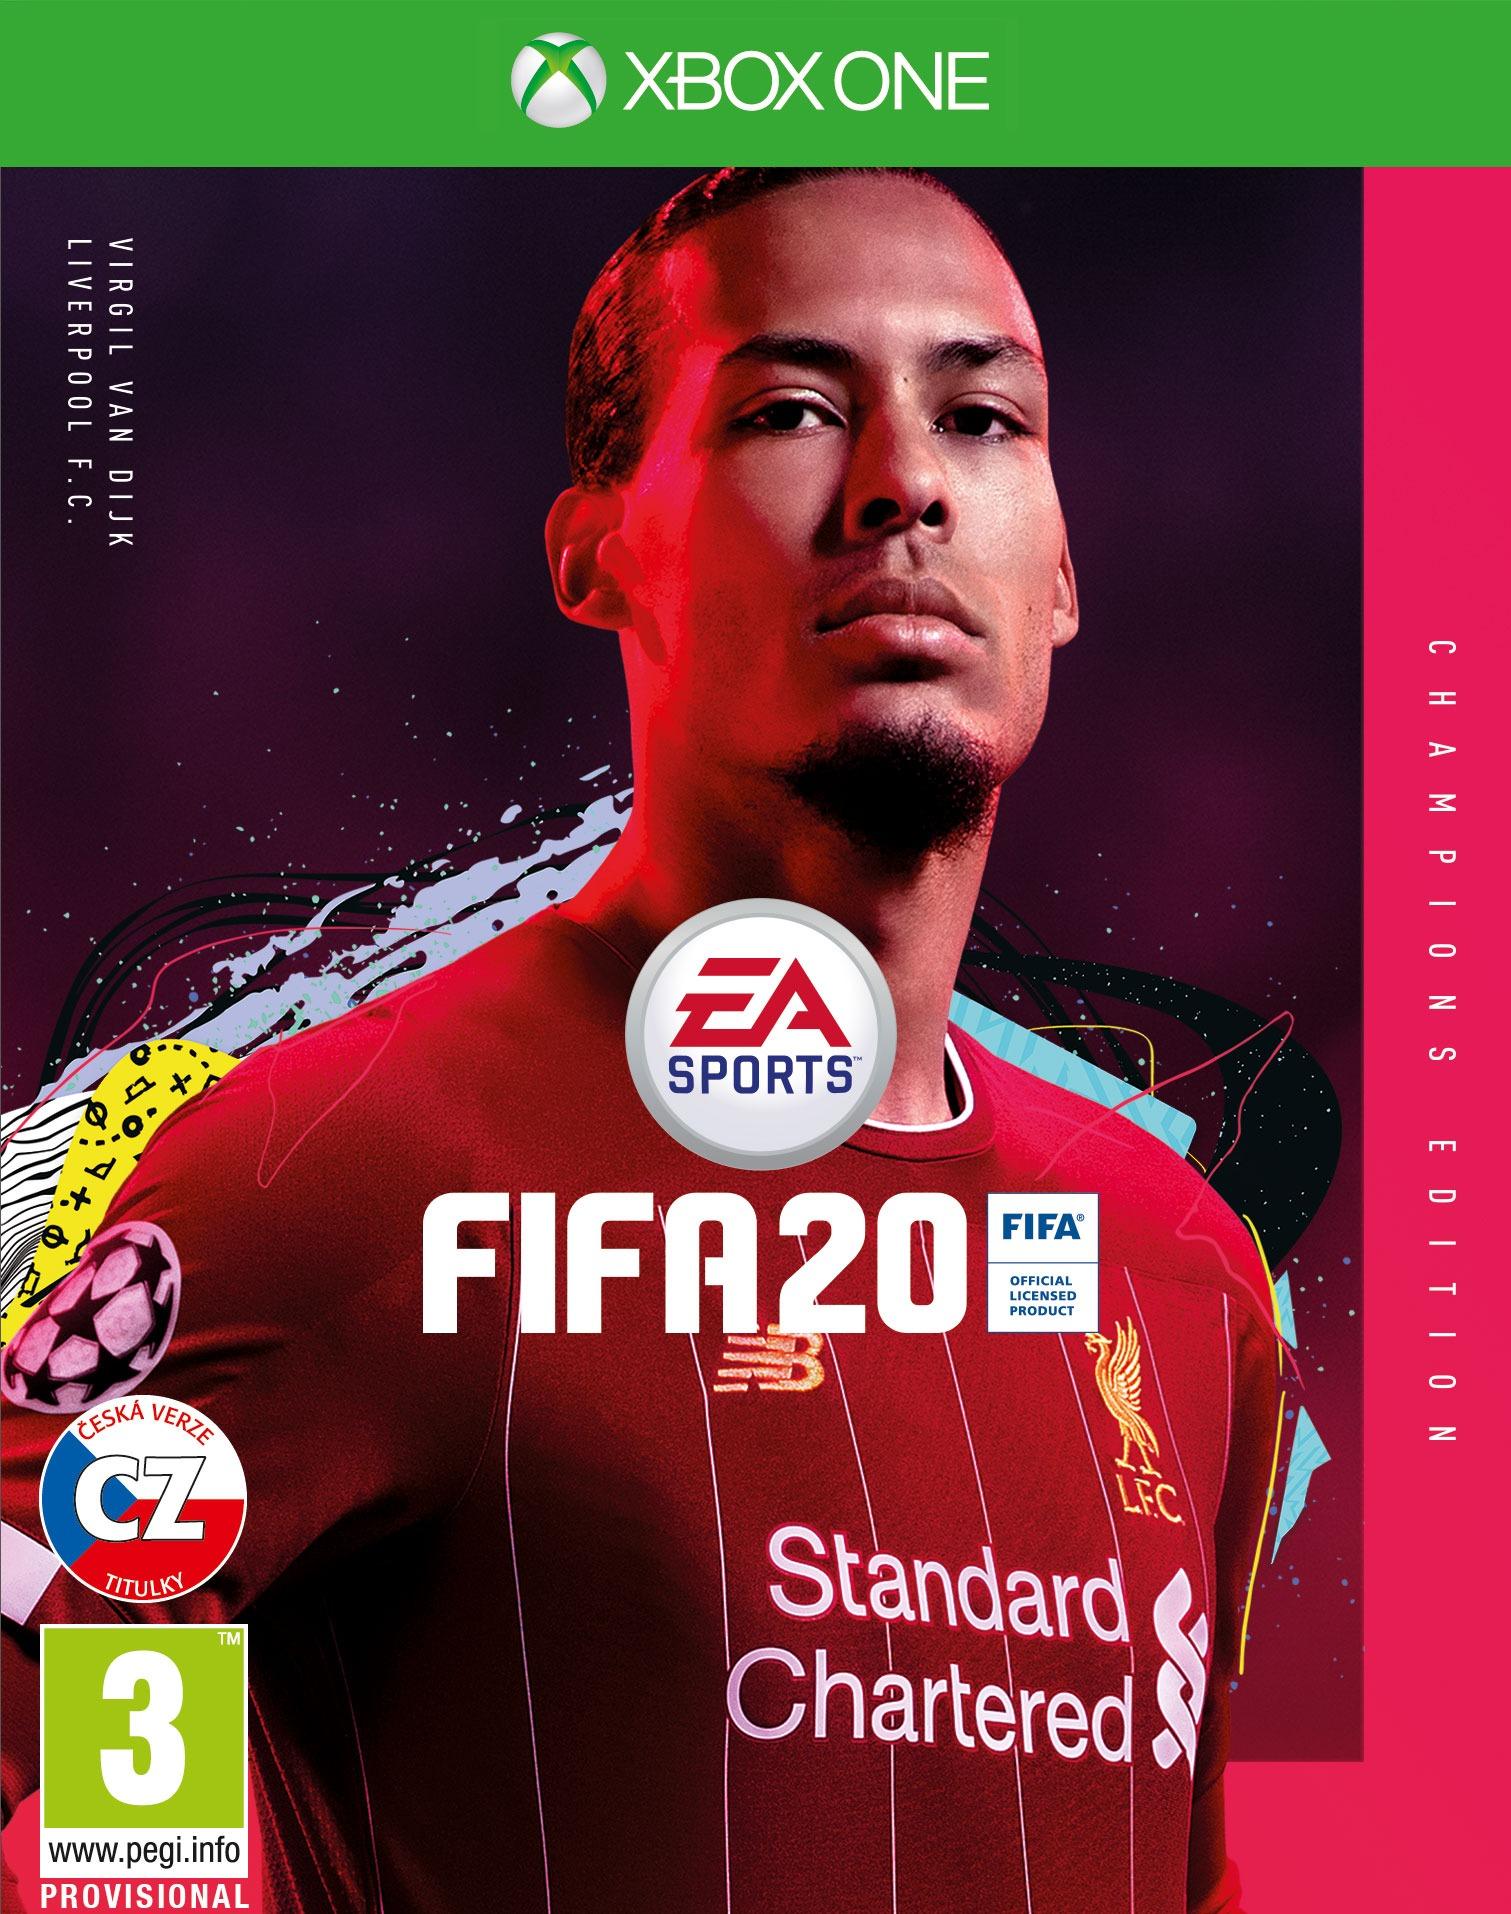 FIFA 20 - Champions Edition (XONE)